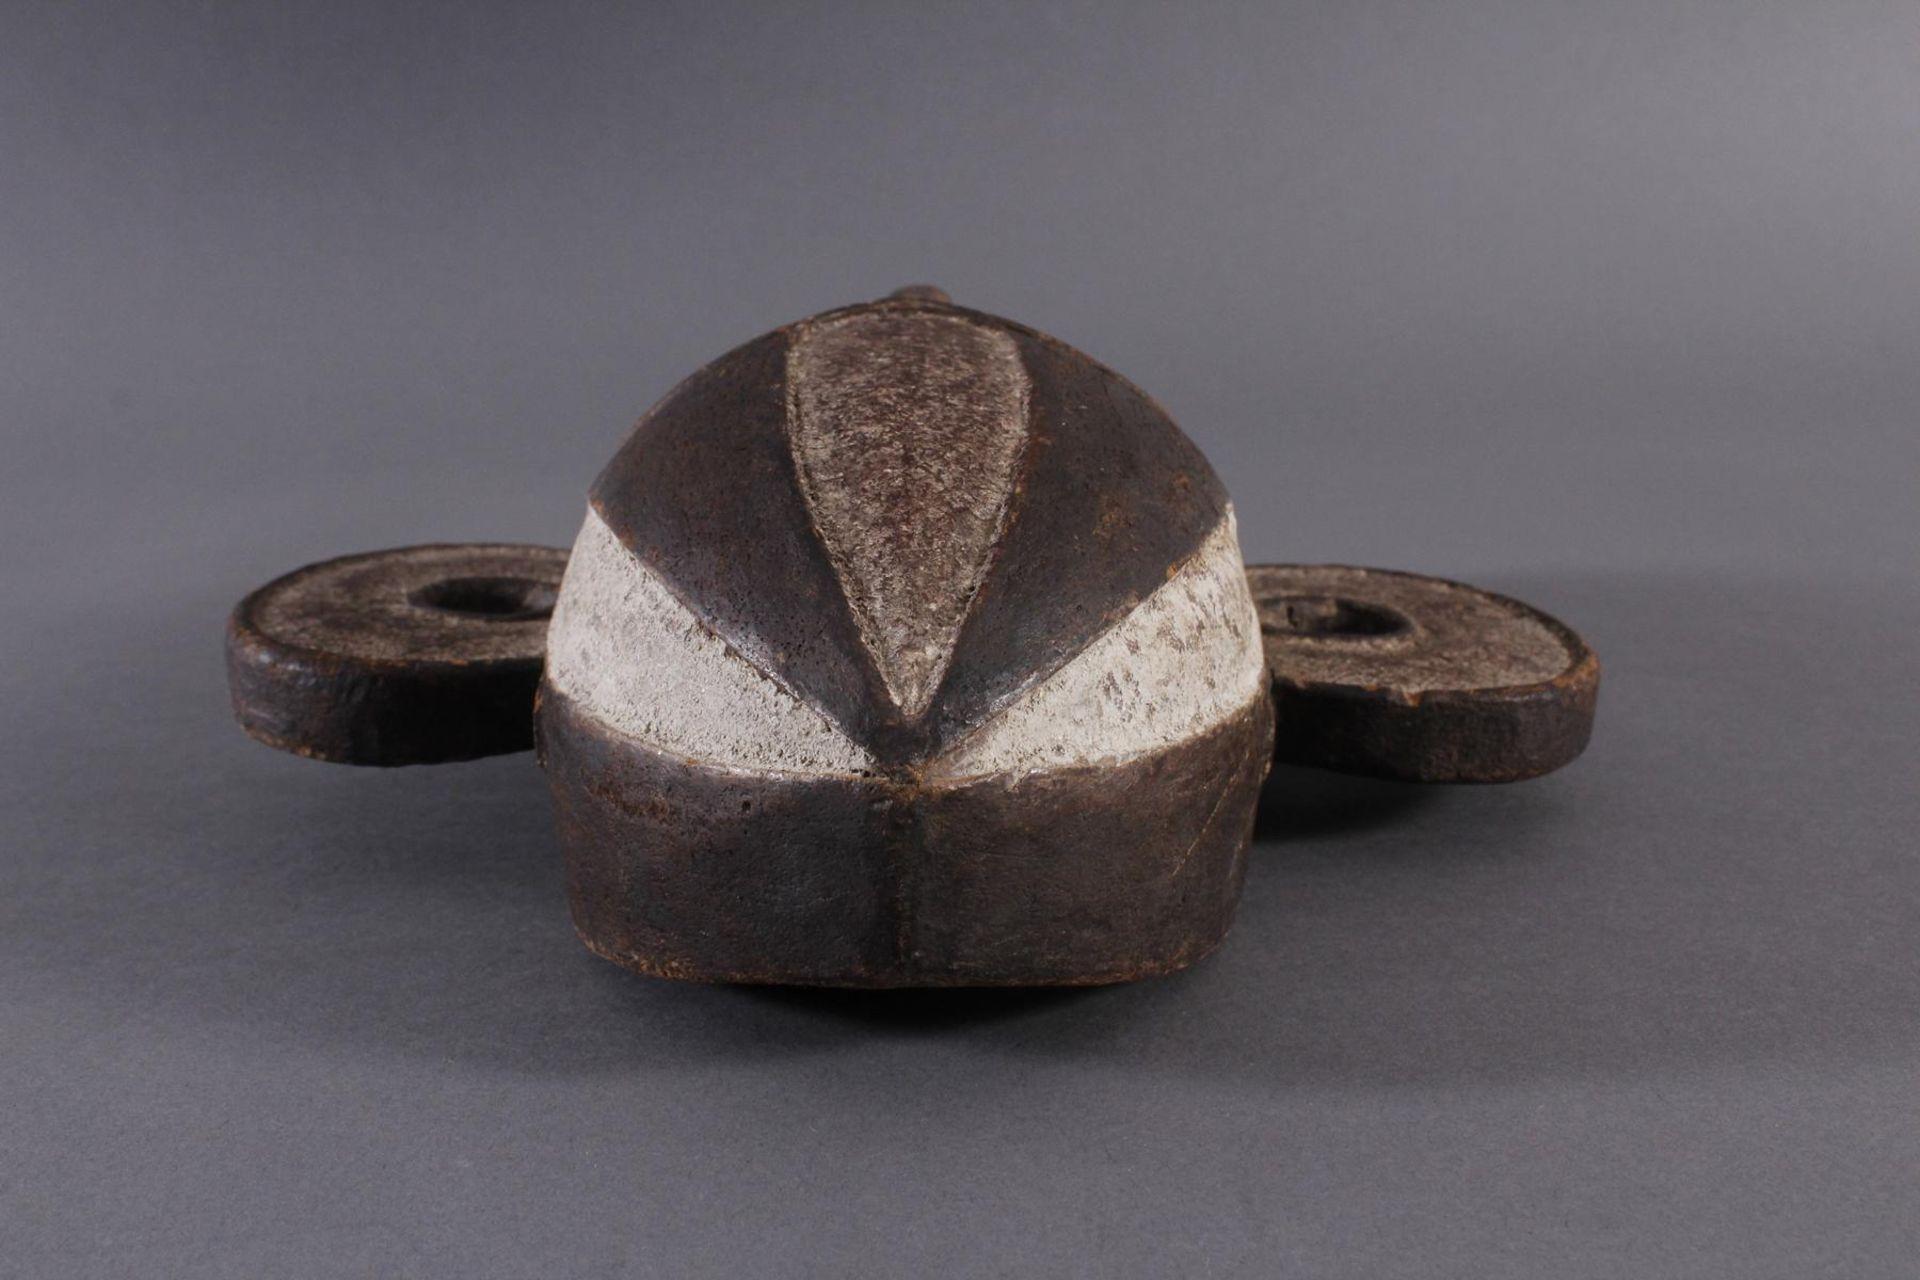 Antike Maske, Boa, Kongo 1. Hälfte 20. Jh.Holz geschnitzt, dunkle Patina, Reste weißer Bemalung, - Bild 4 aus 6